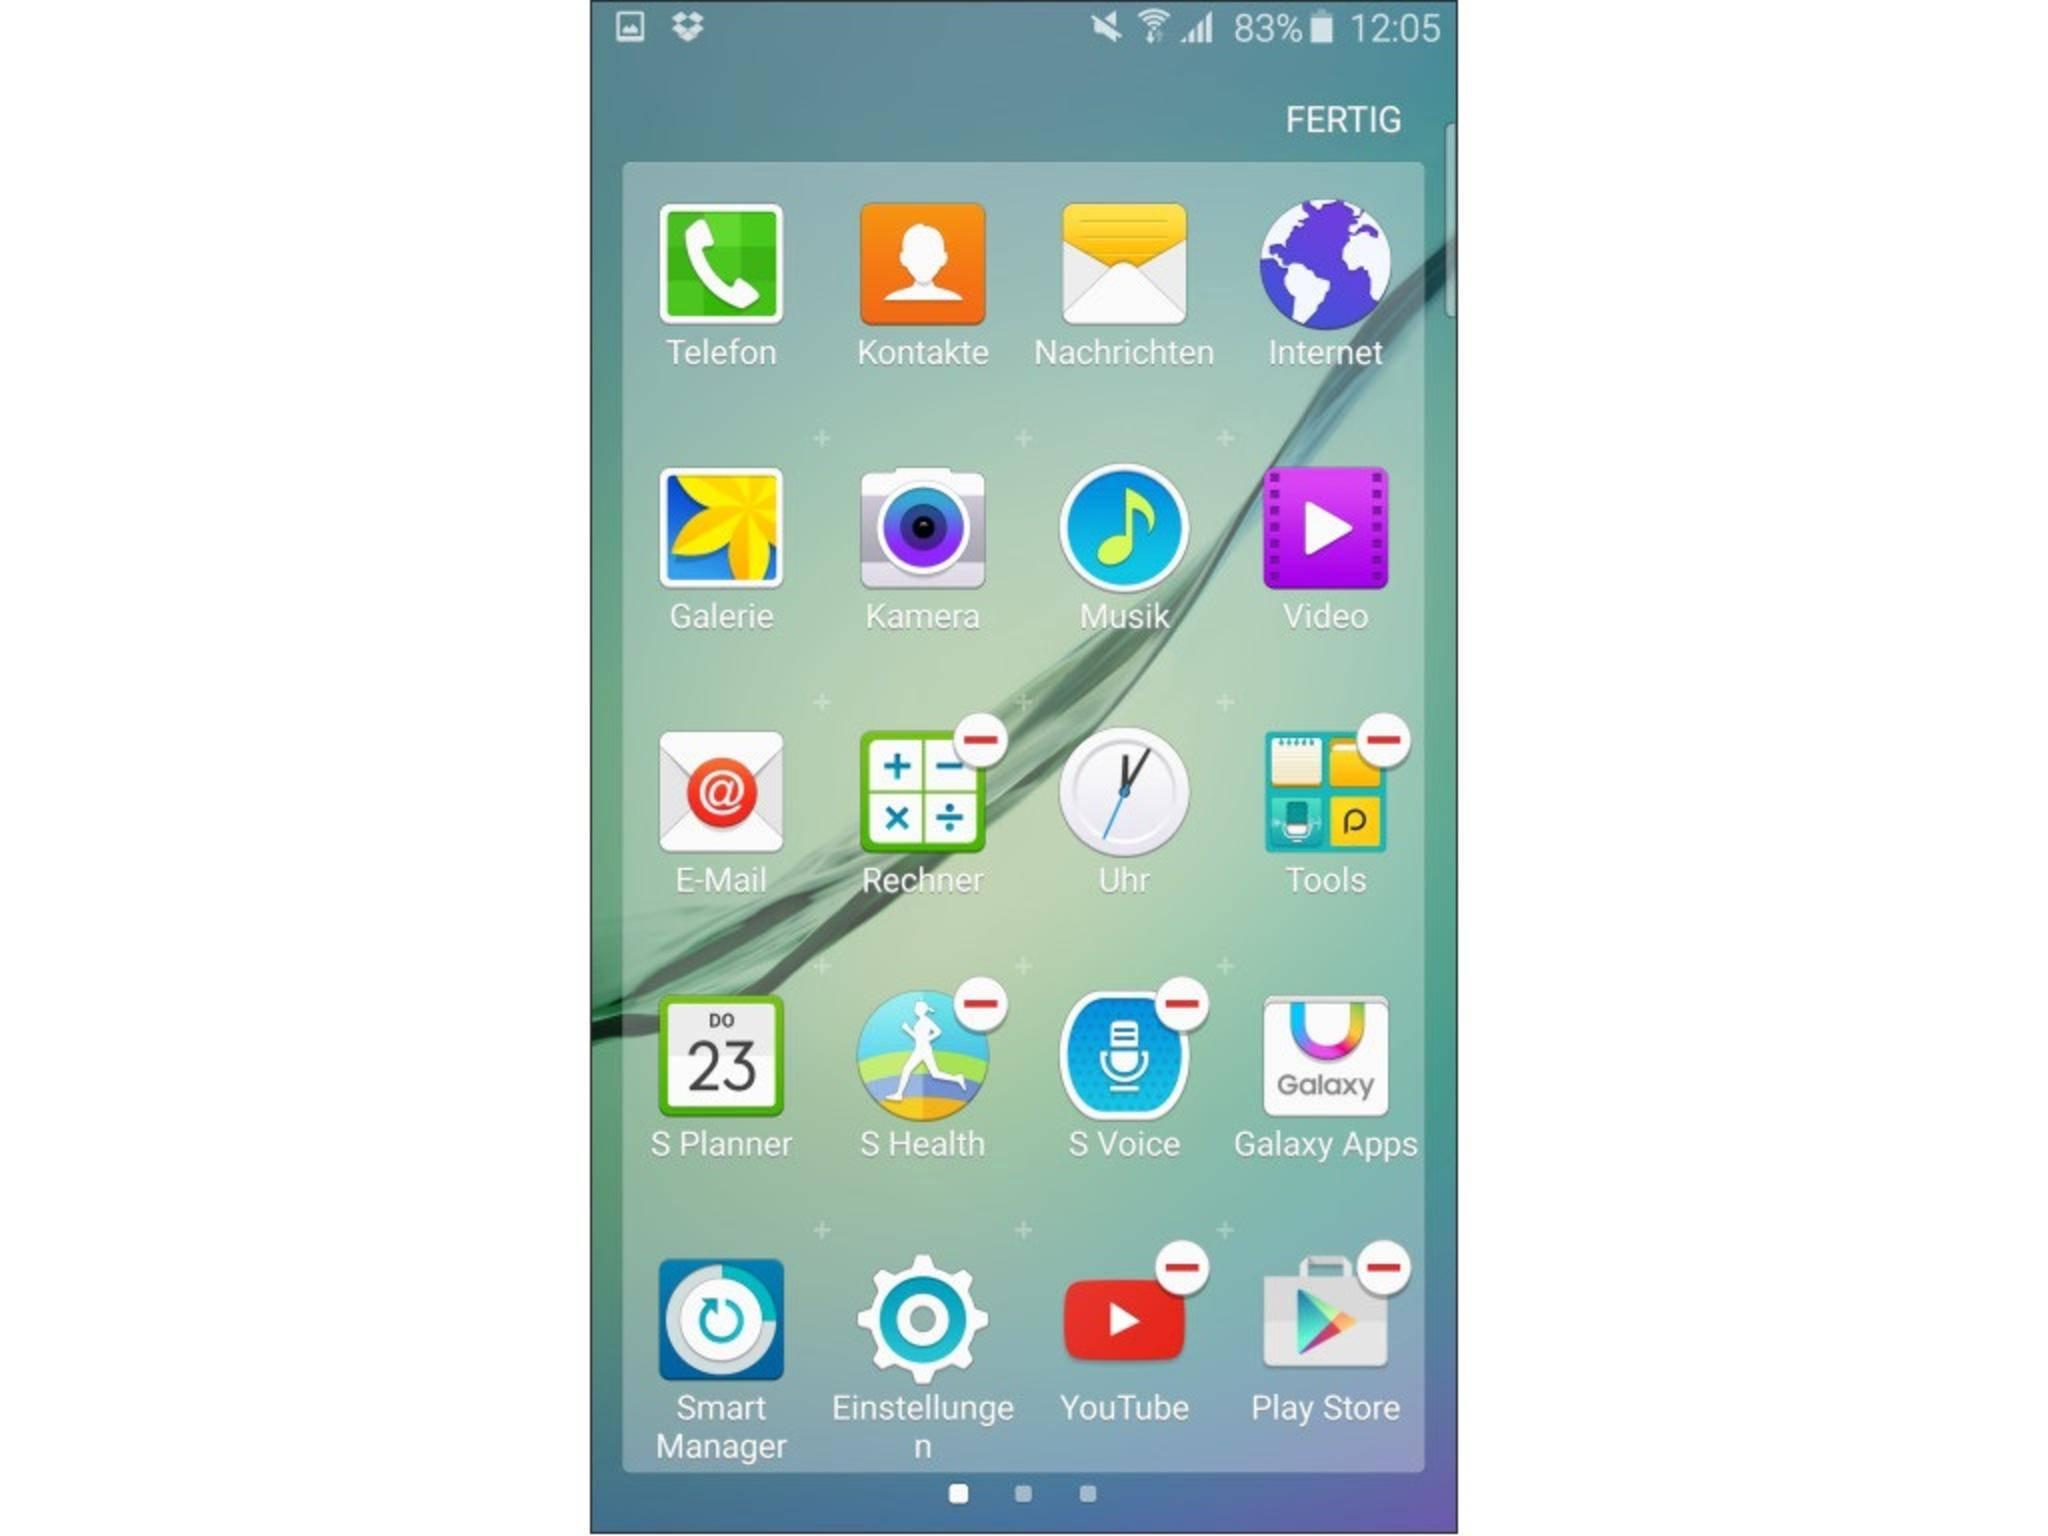 Galaxy S6 Screenshot 11